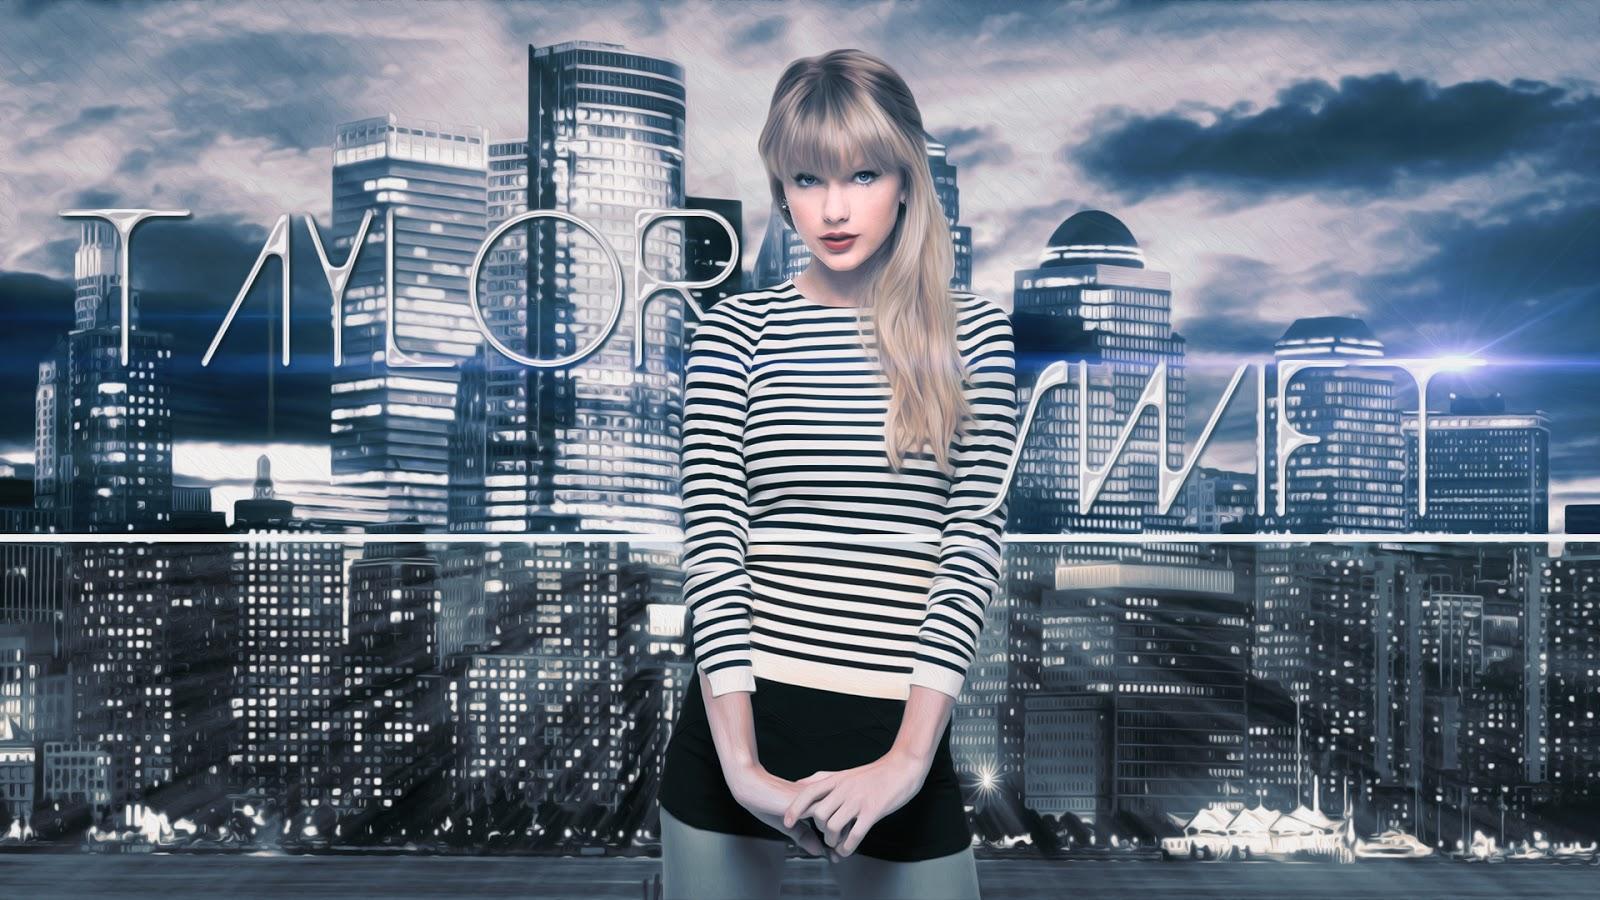 Taylor Swift High Building Wallpaper HD